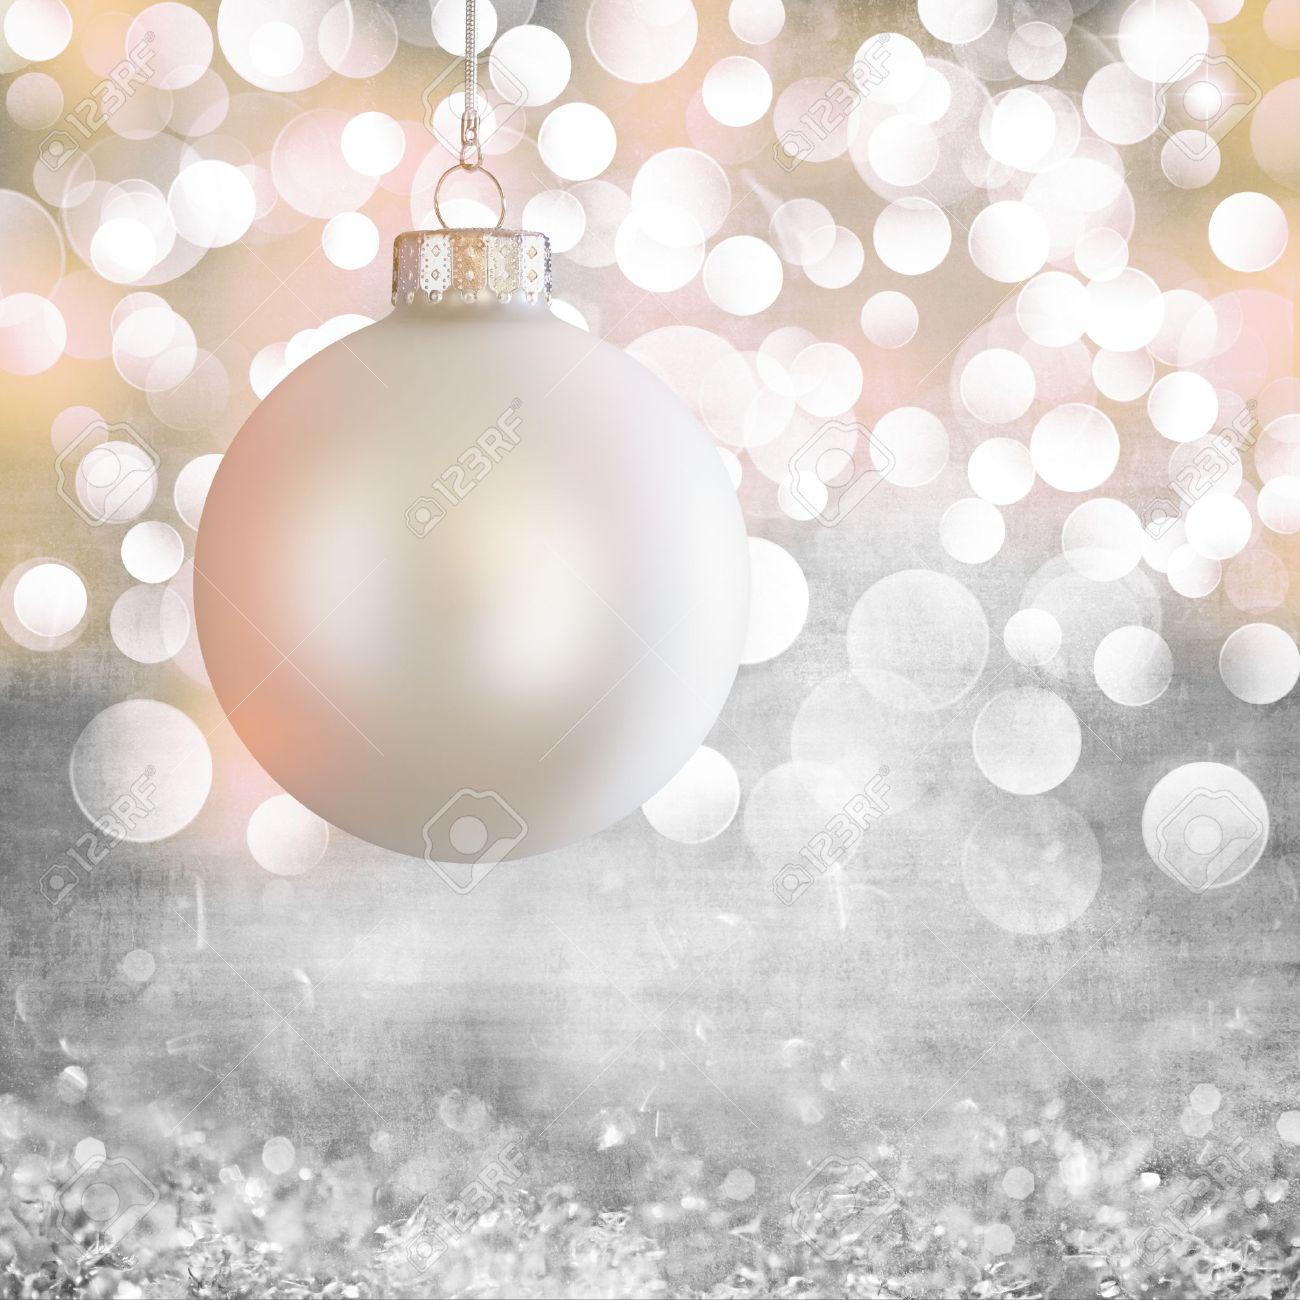 Vintage White Christmas Ball Ornament Over Elegant Grunge Grey ...